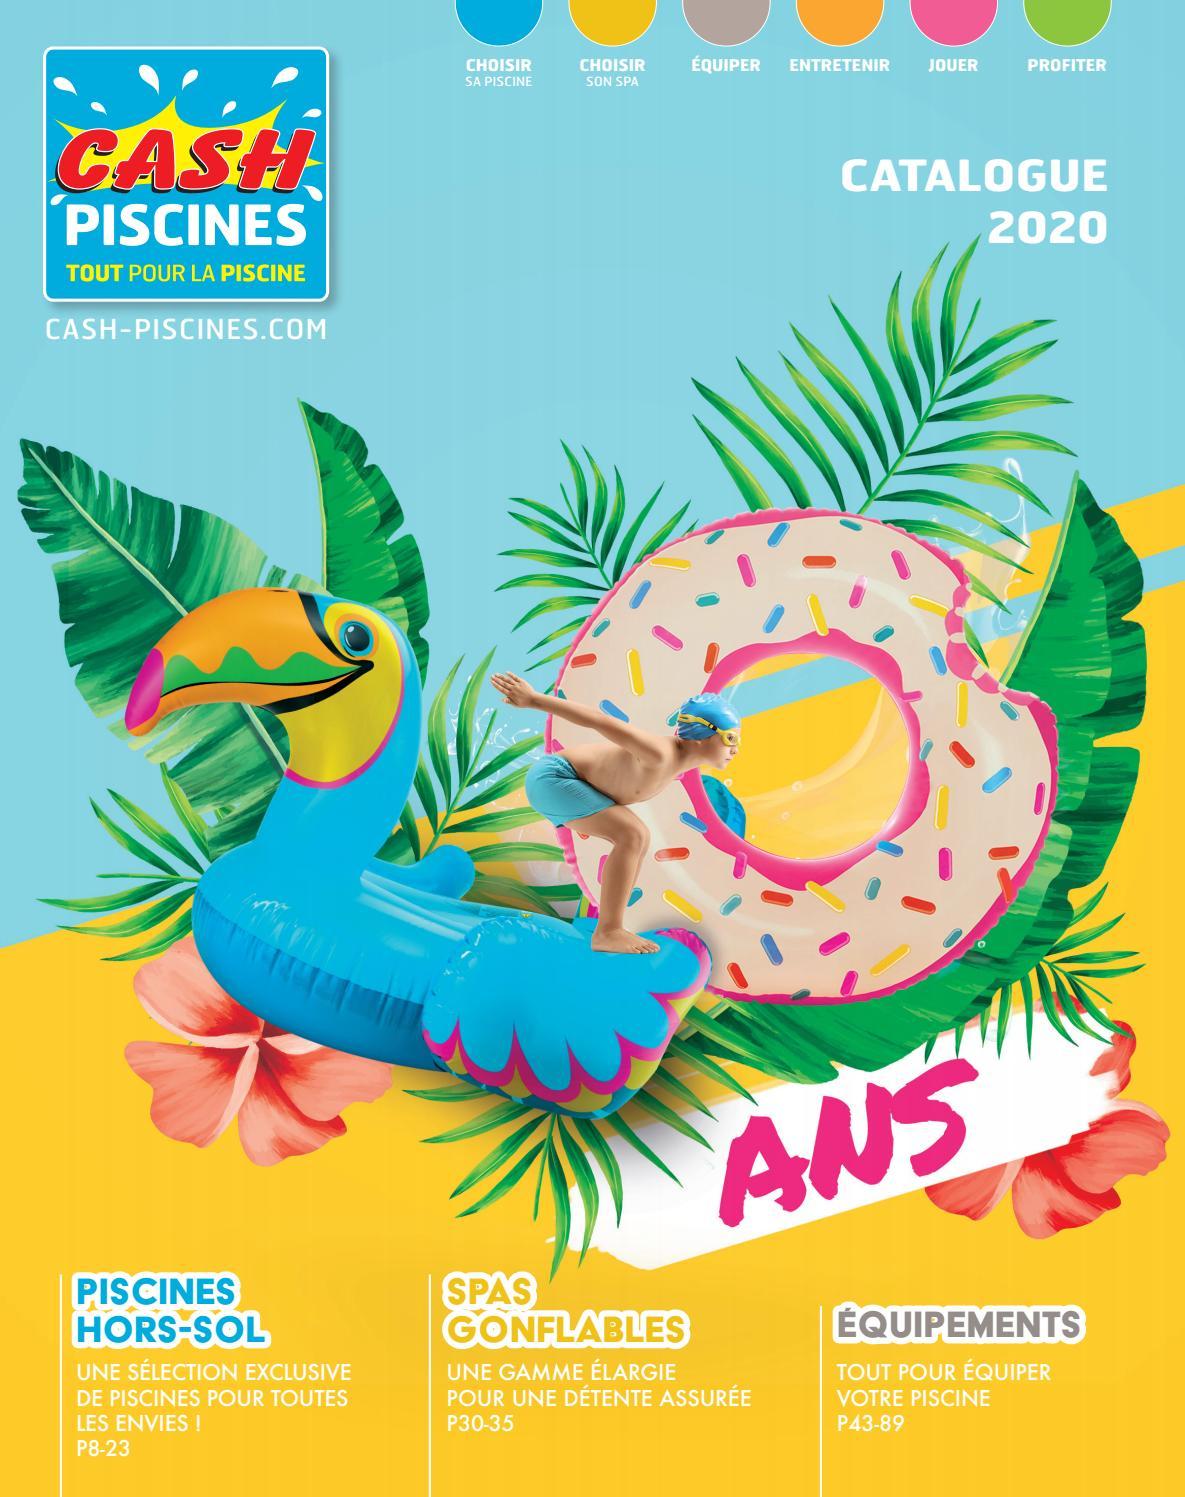 Catalogue Cash Piscines 2020 By Cashpiscines2 - Issuu tout Cash Piscine Cahors